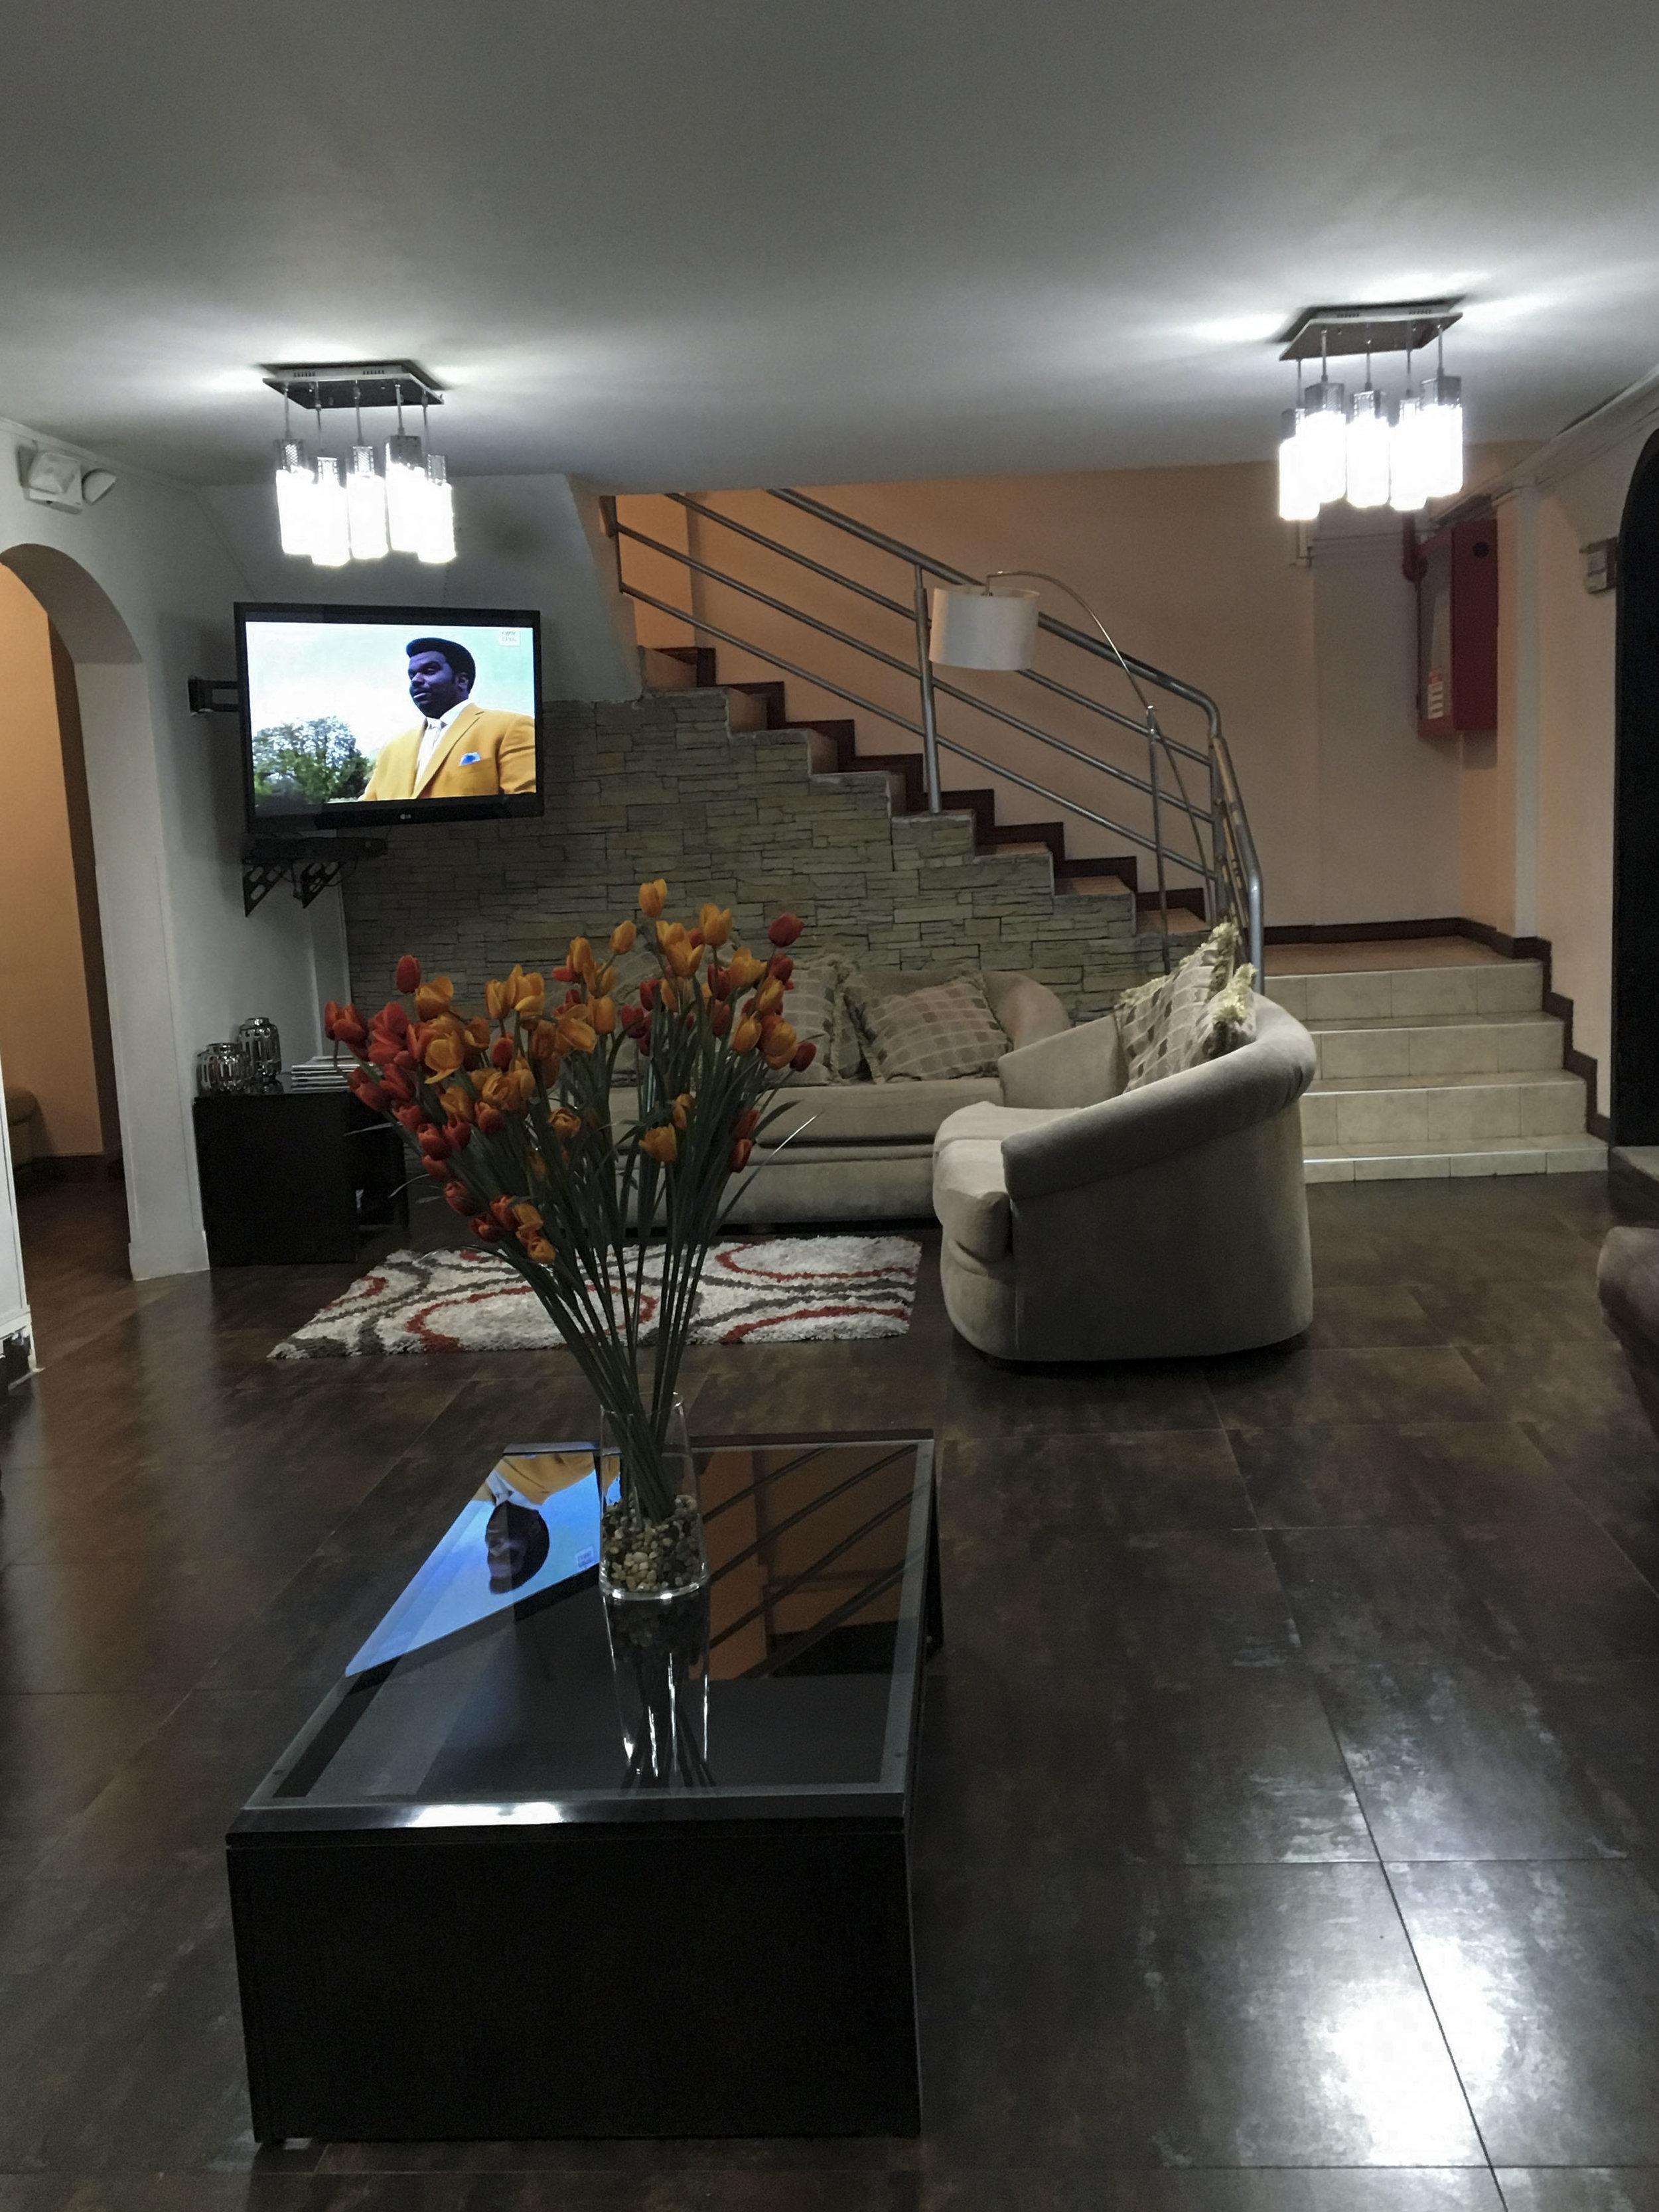 Quito hotel edited.jpg